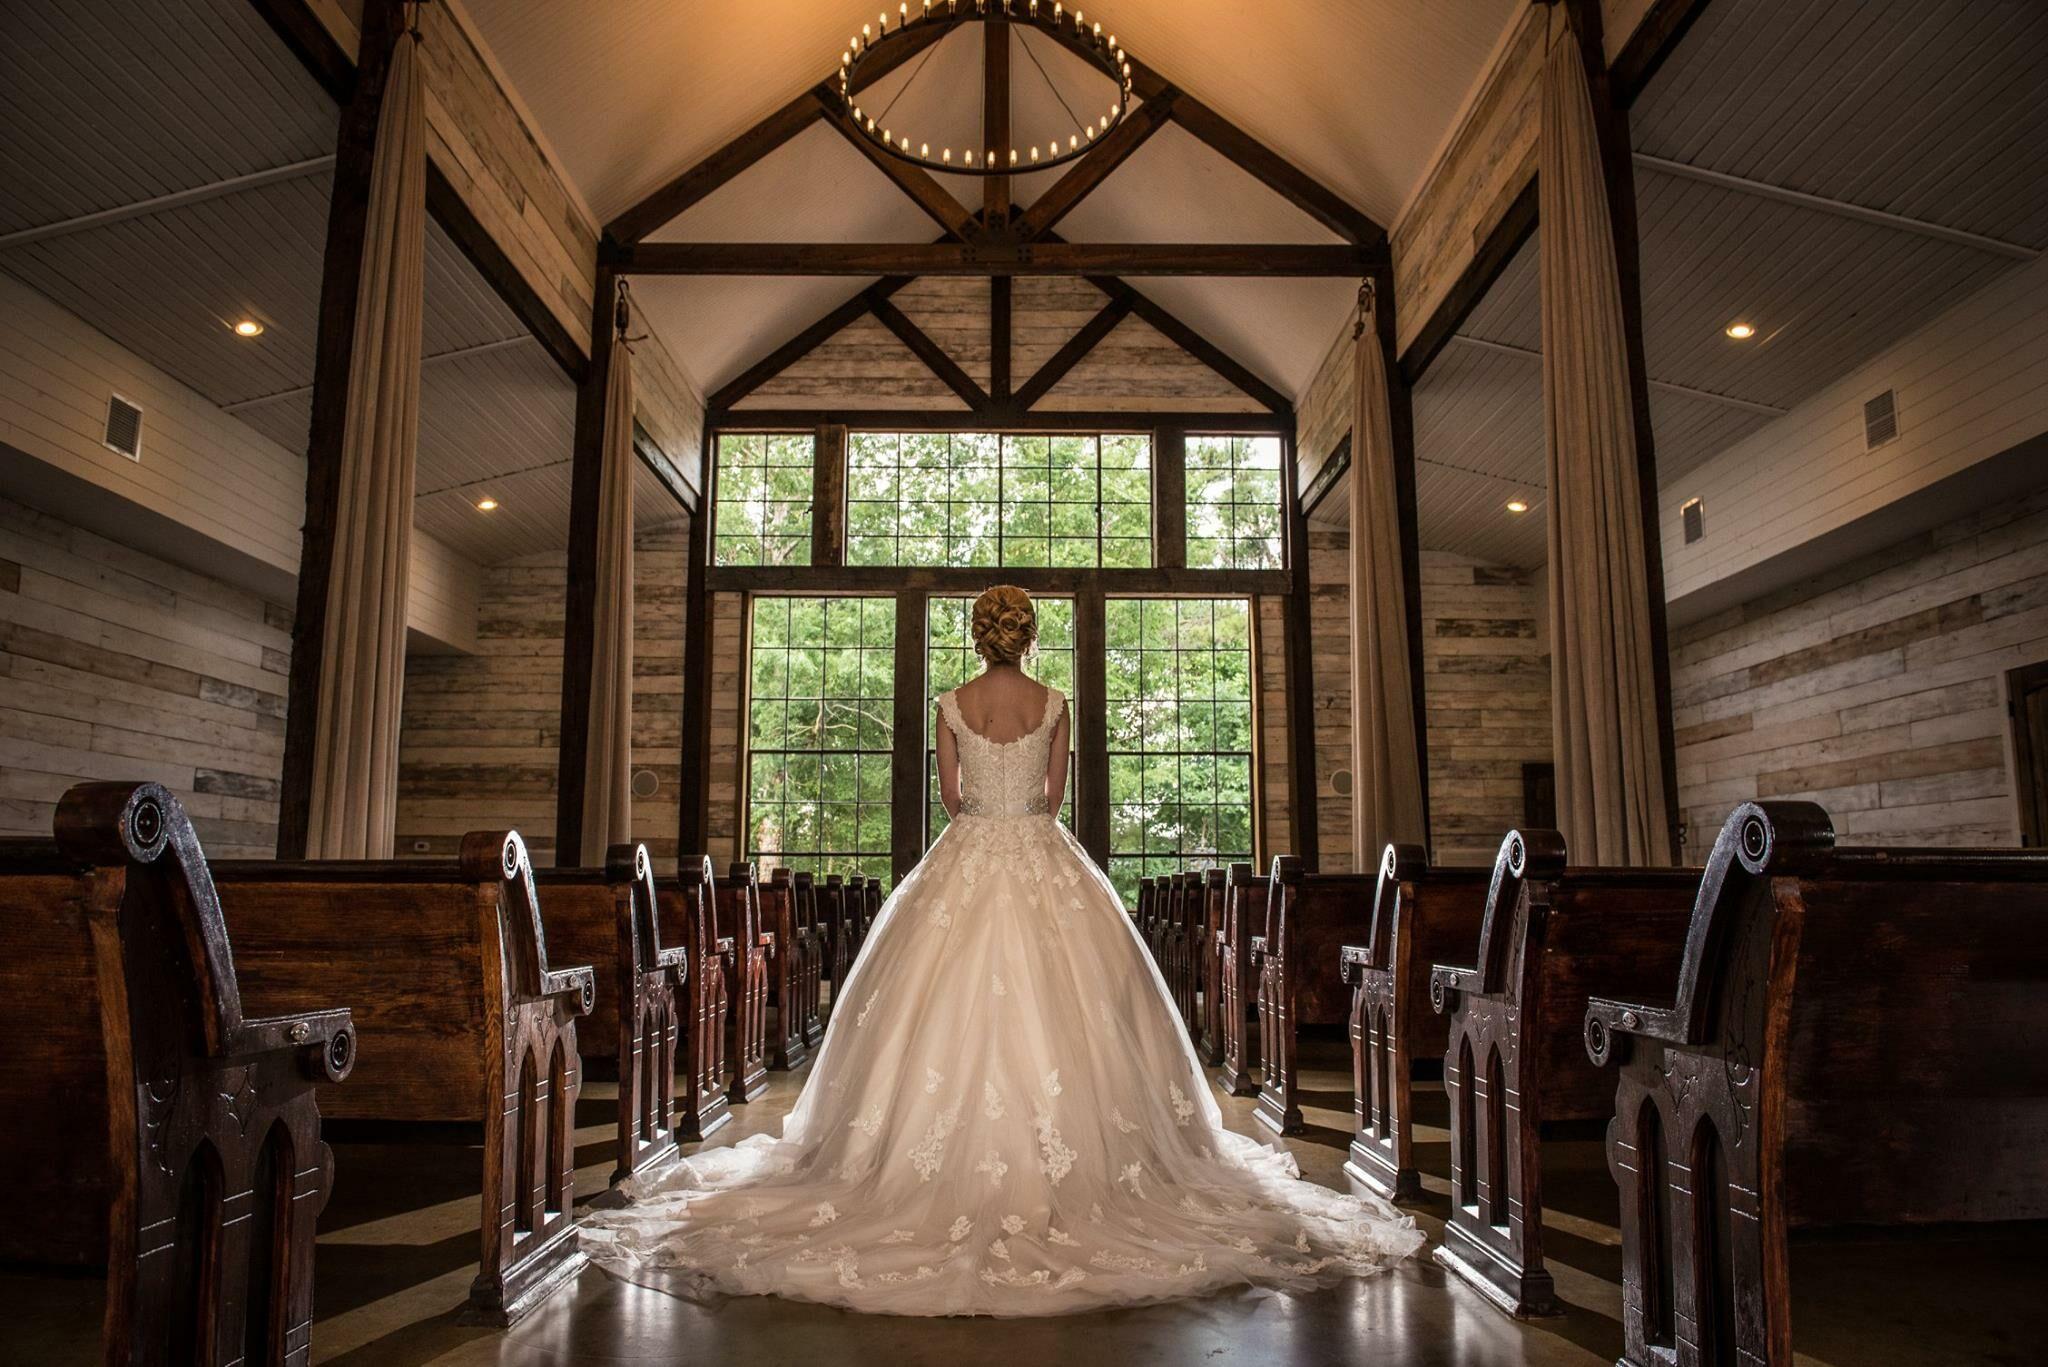 7 Bridges Wedding And Event Venue